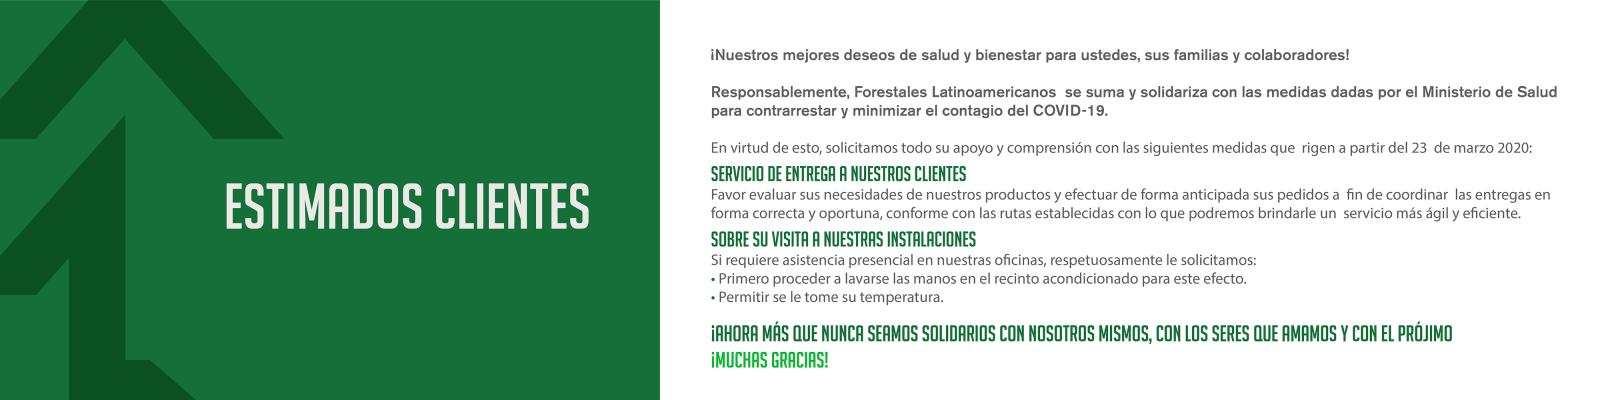 FL-Comunicado-Coronavirus-4000x1000px_Banner-Web